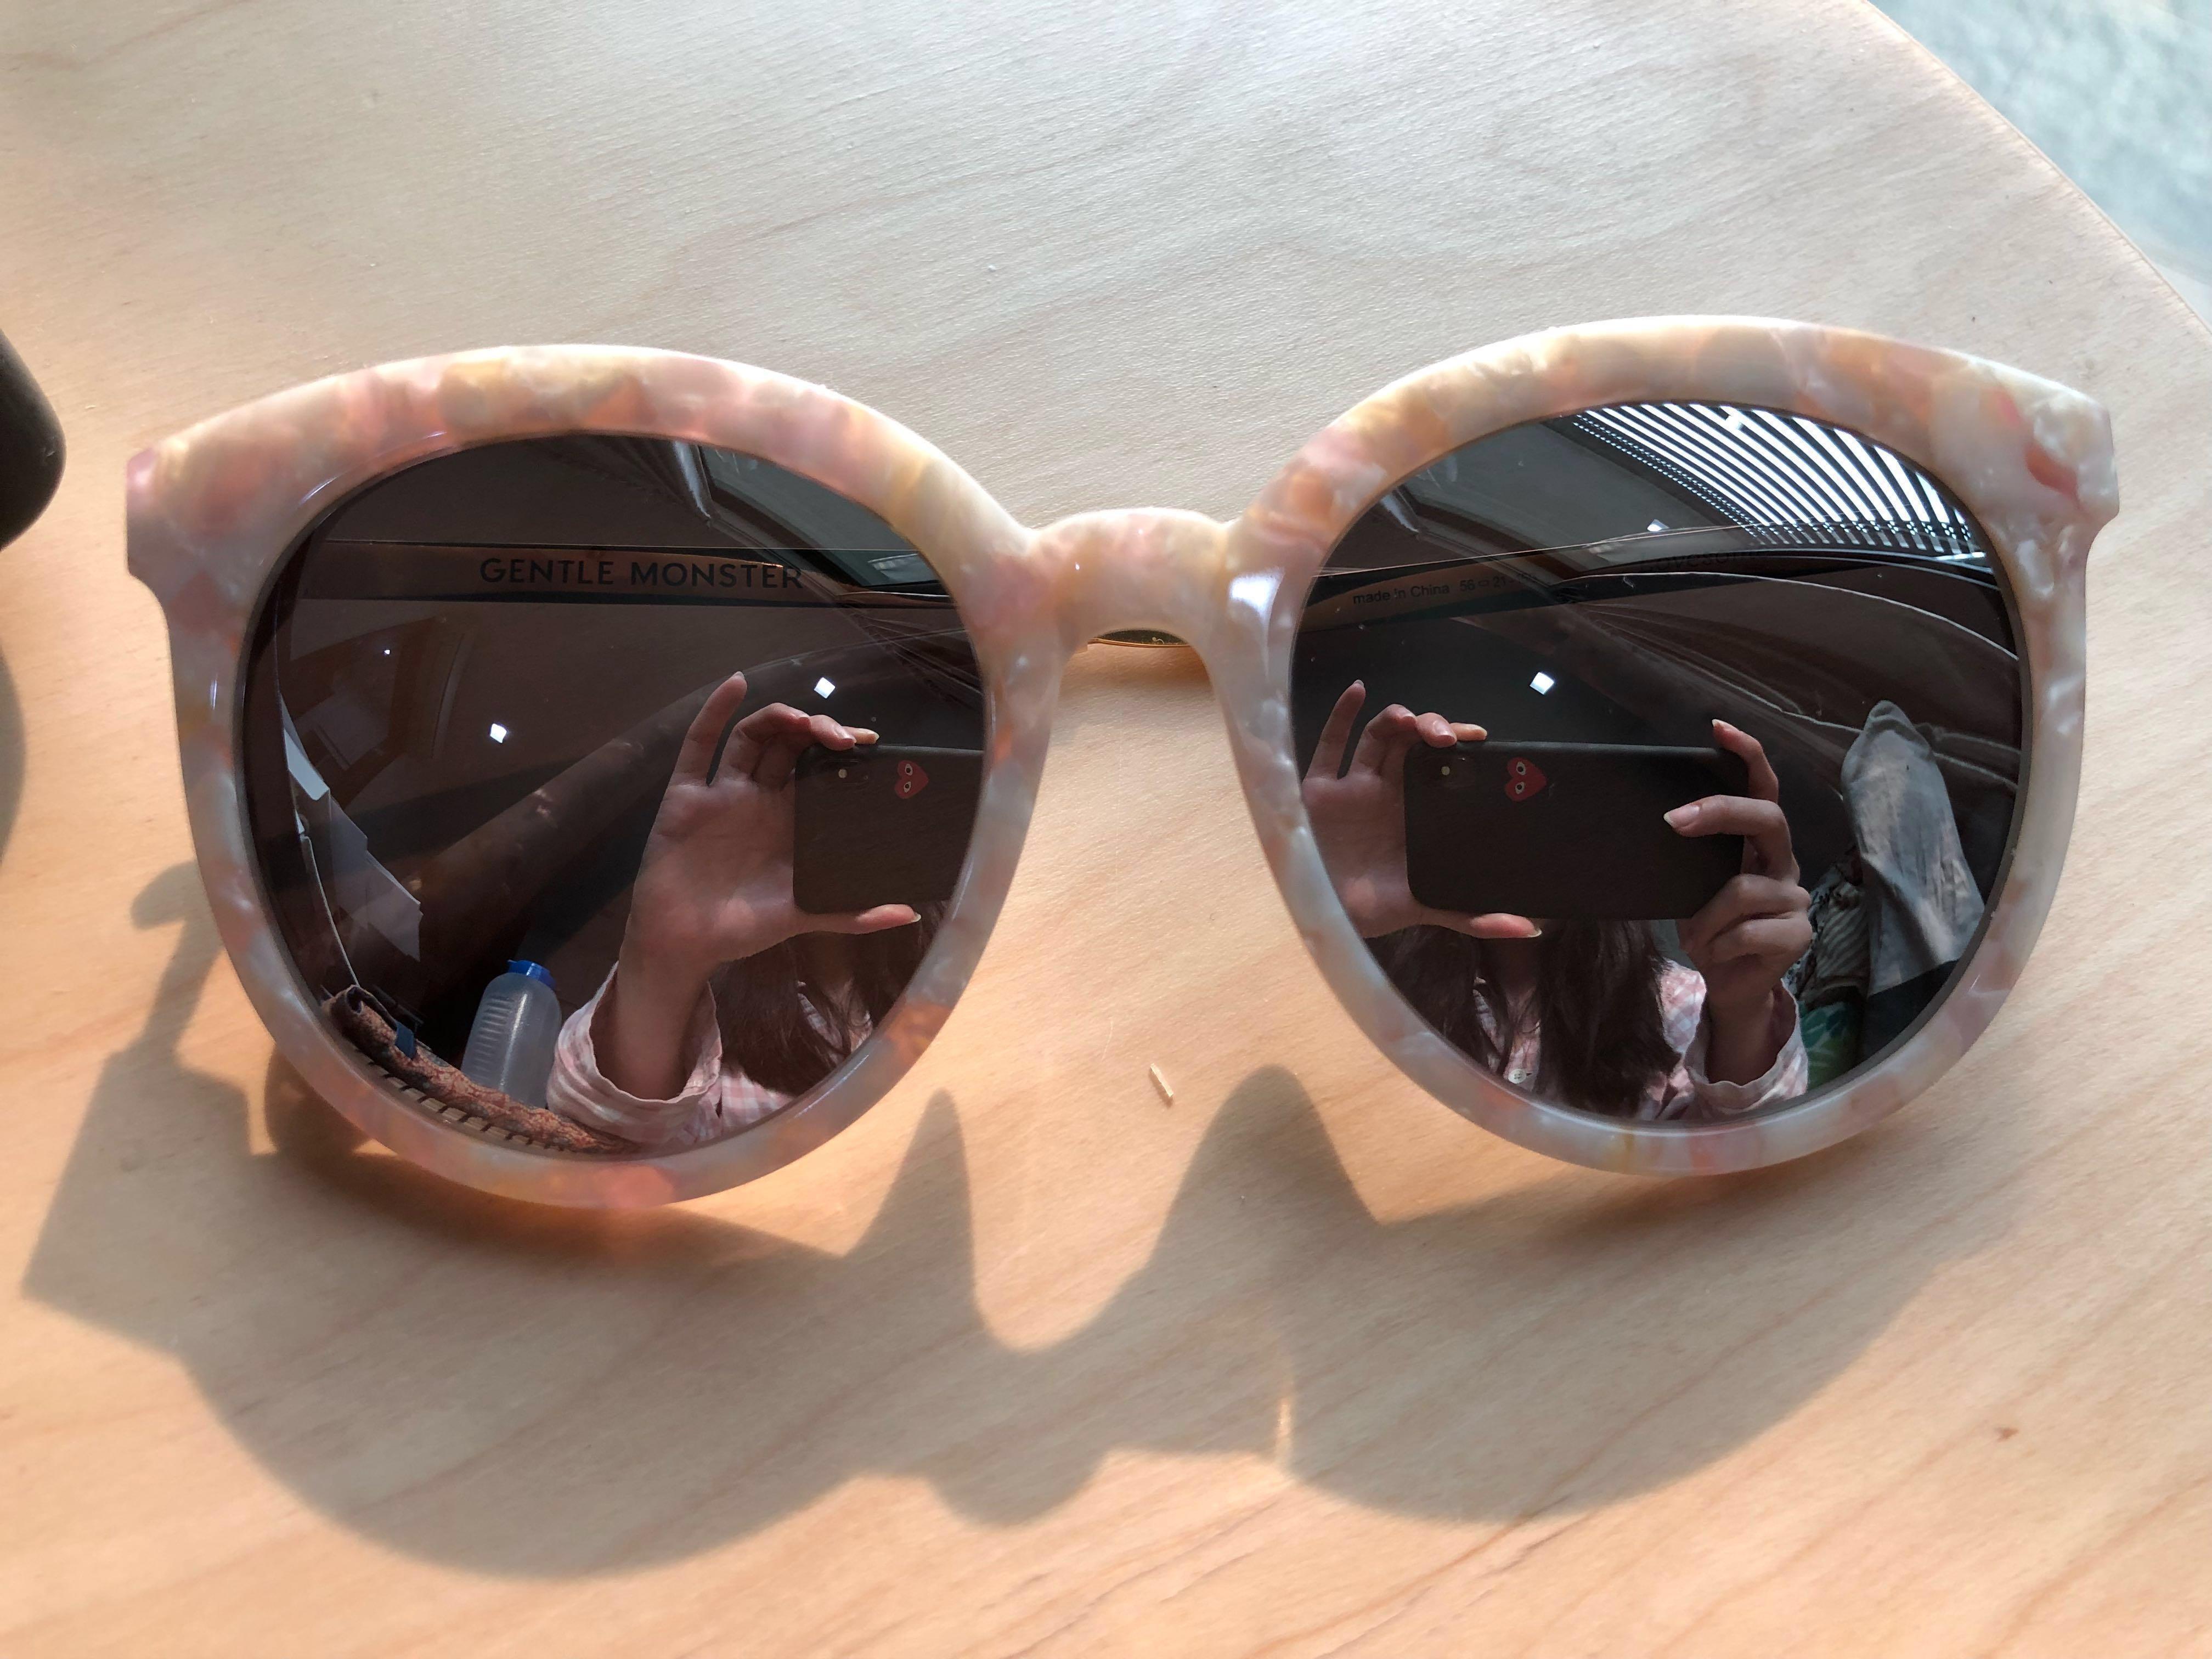 ff58da34dda7 Home · Women s Fashion · Accessories · Eyewear   Sunglasses. photo photo ...